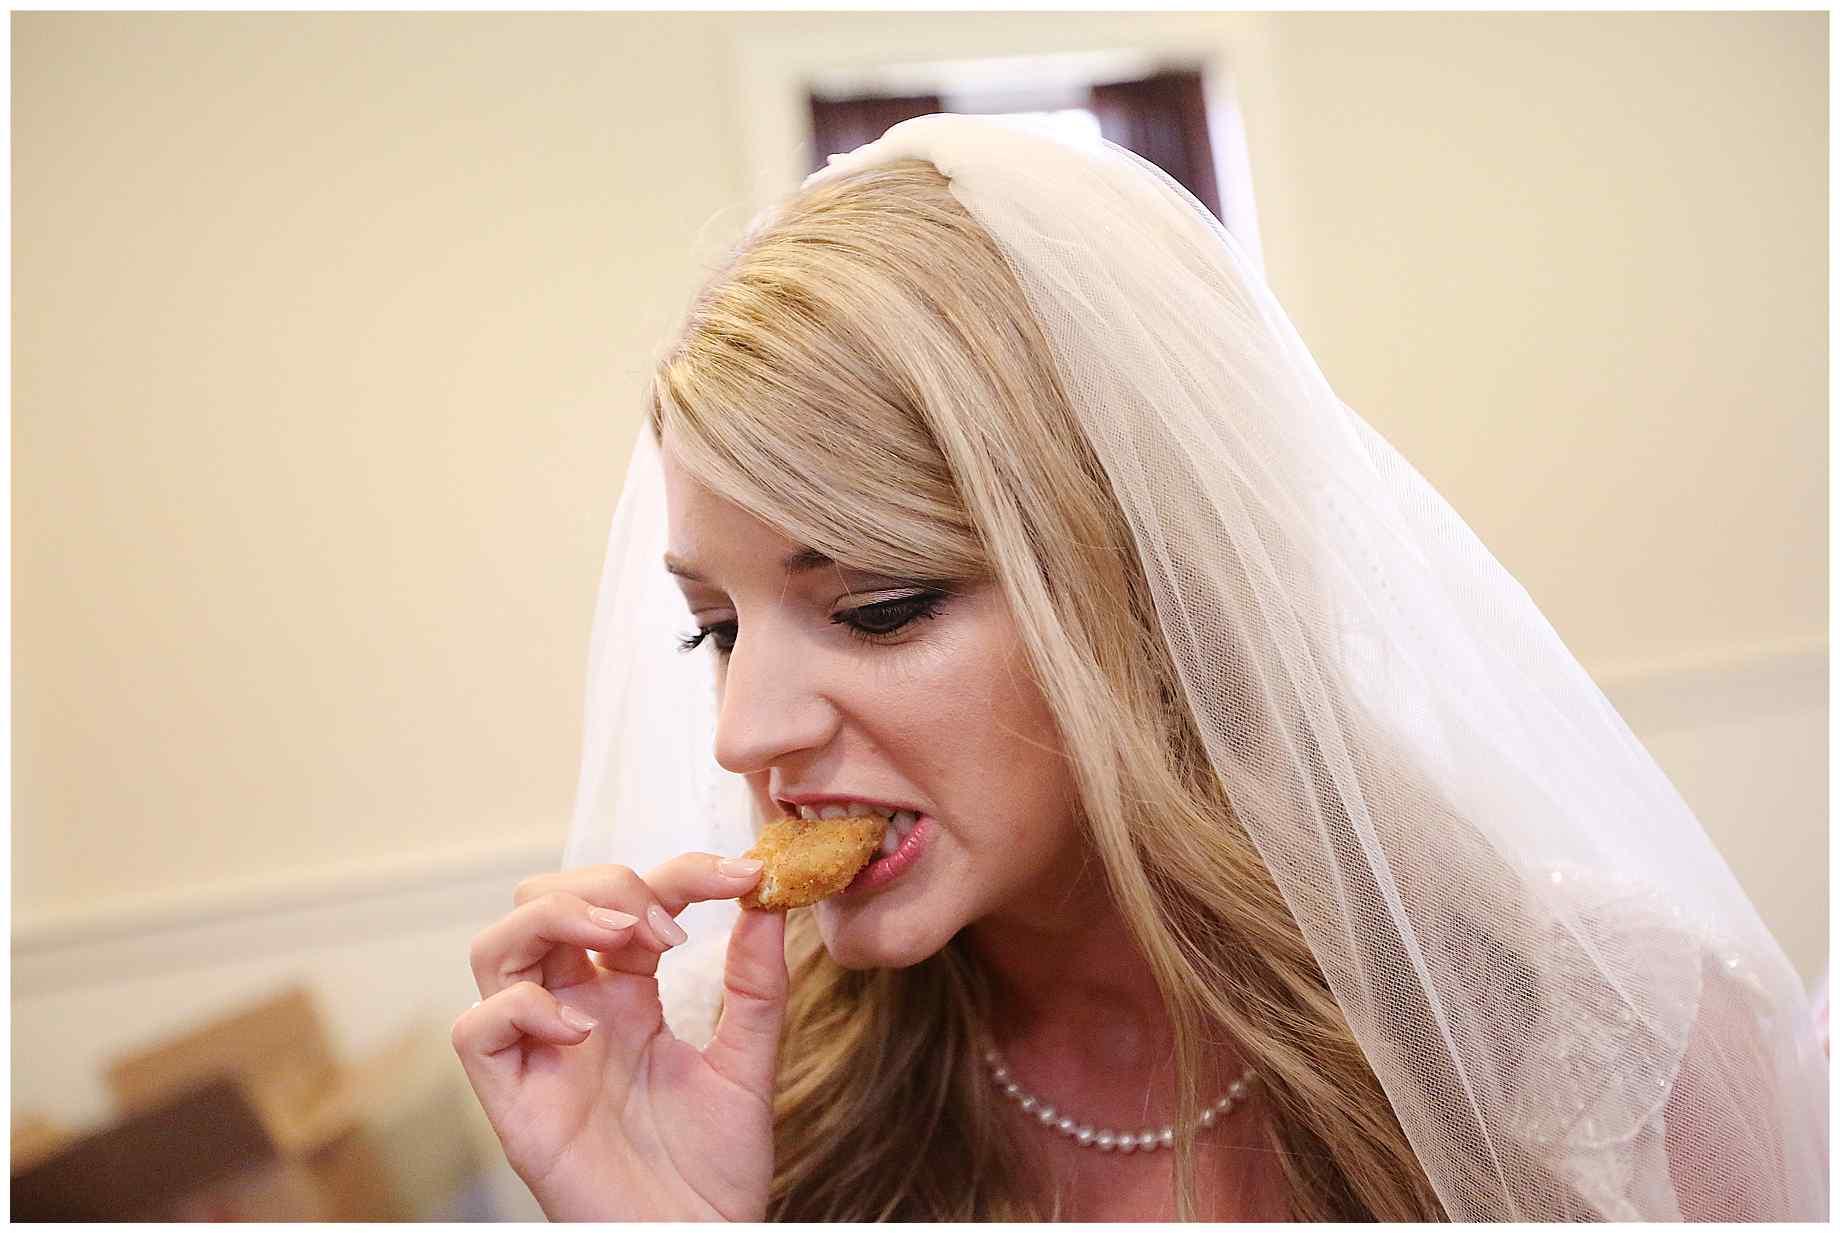 centenary-college-wedding-photos-shreveport-010